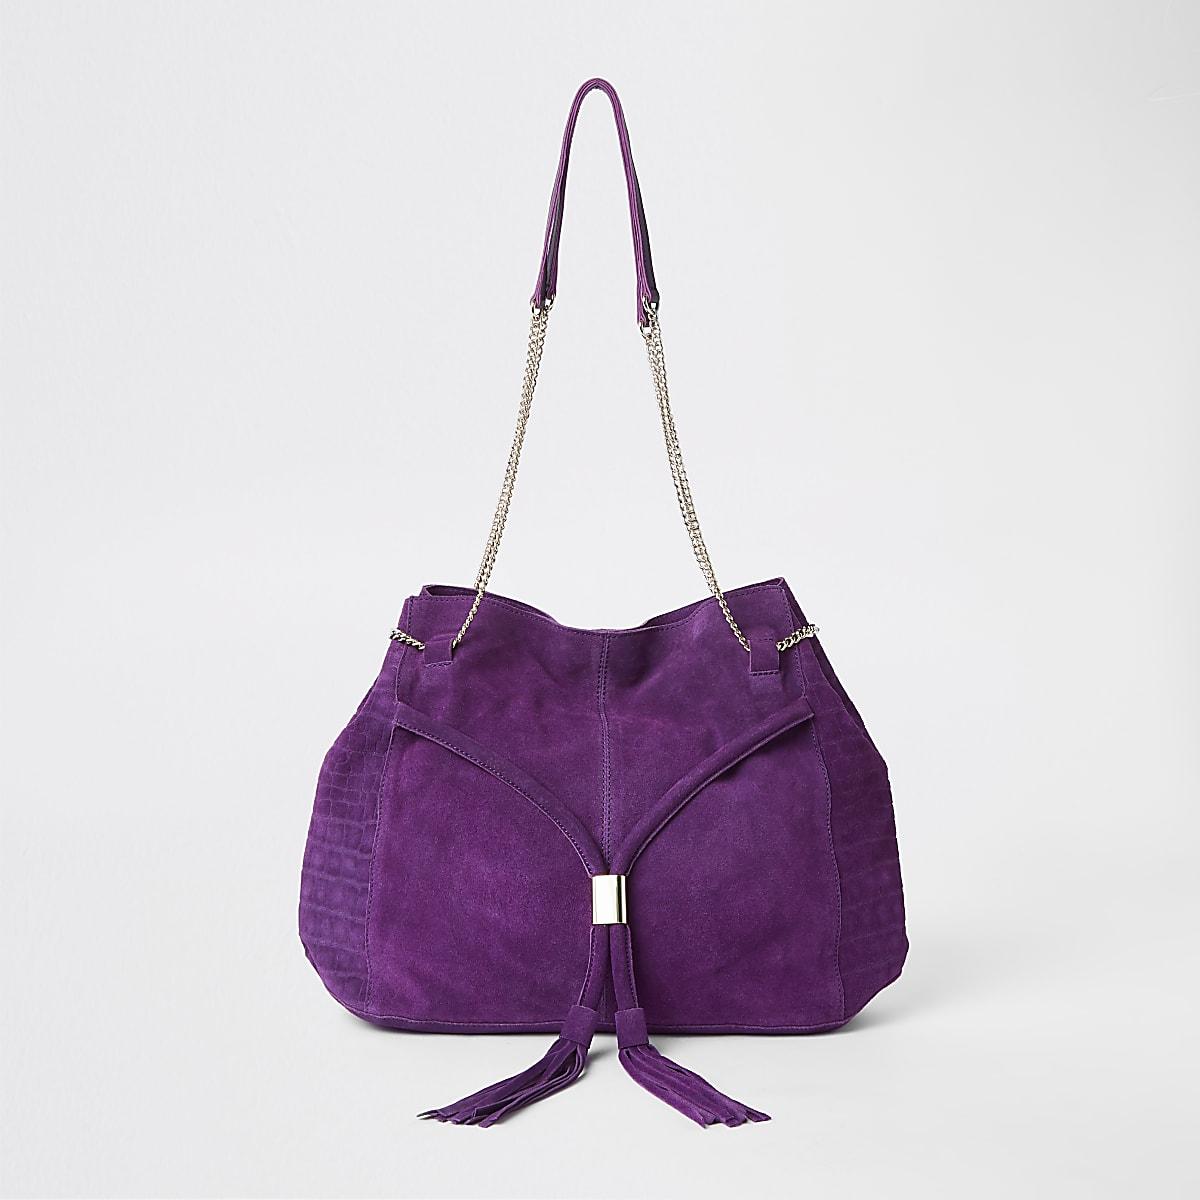 Purple leathe chain slouch bag